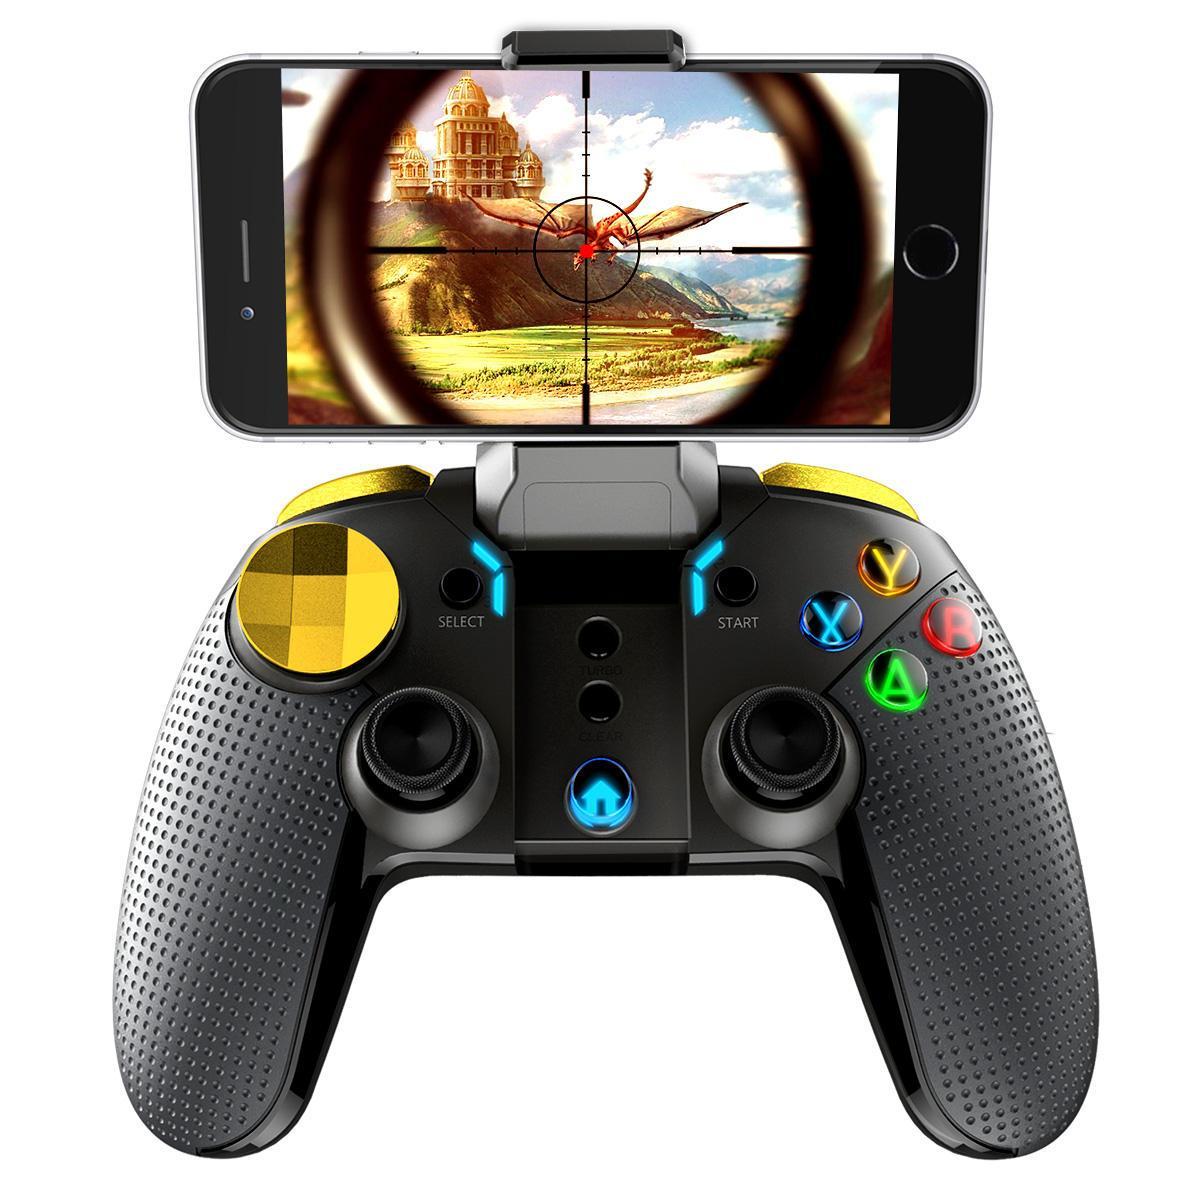 Беспроводной геймпад iPega PG-9118 Bluetooth Android/iOS/Win Black (SGWGCP9118)